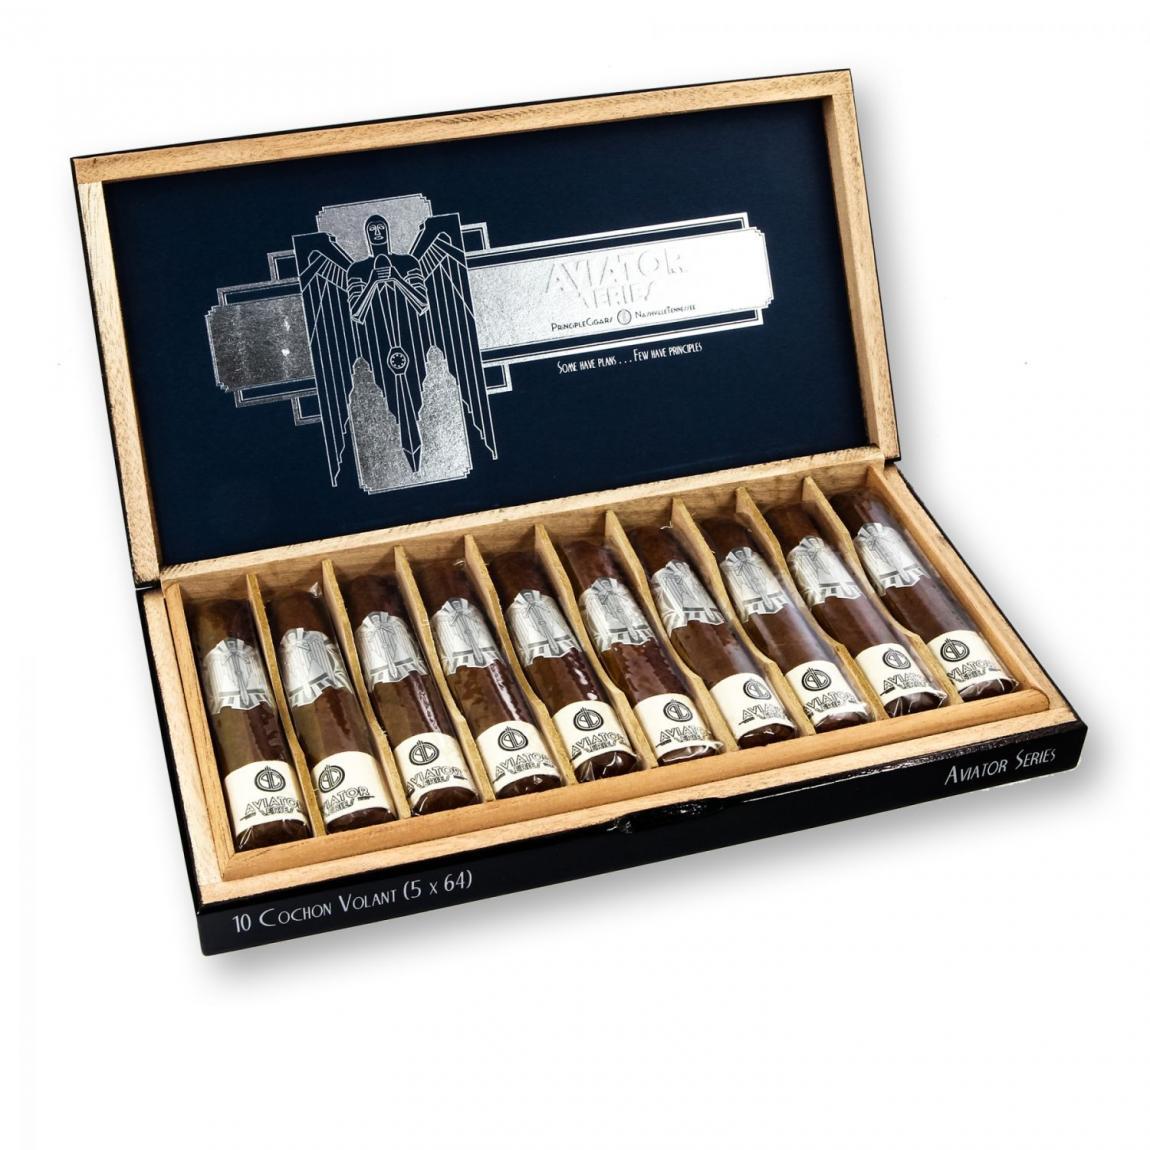 Principle Cigars »Aviator« Cochon Volant, 10er Kiste